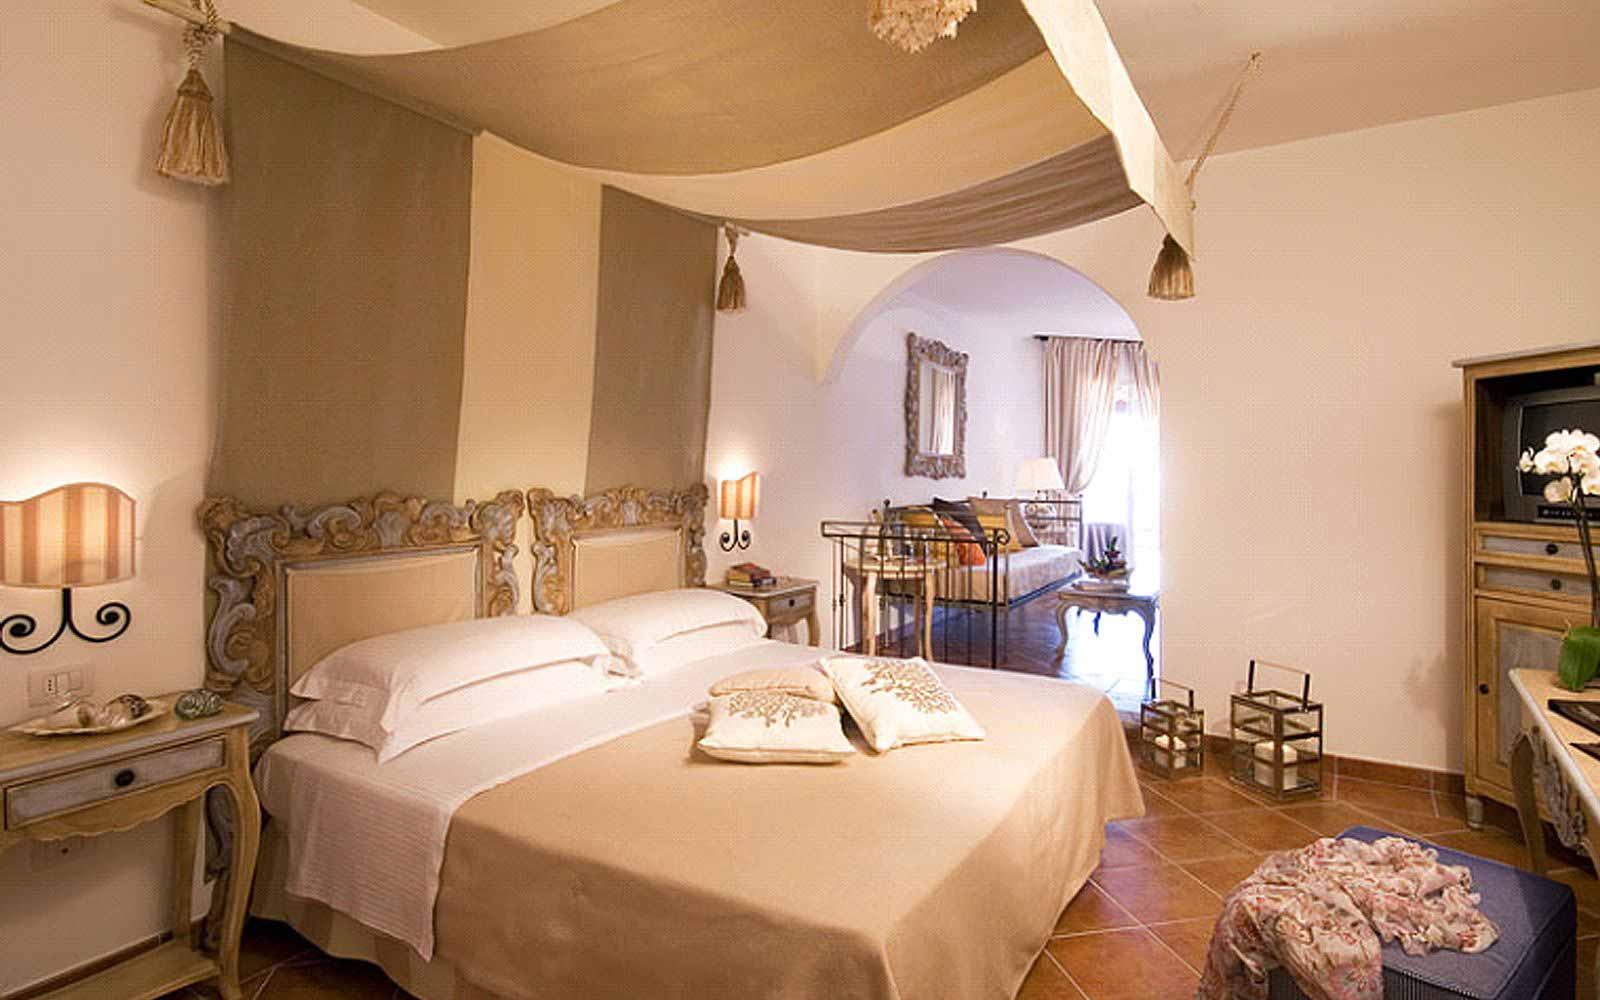 Junior Suite at the Colonna Grand Hotel Capo Testa